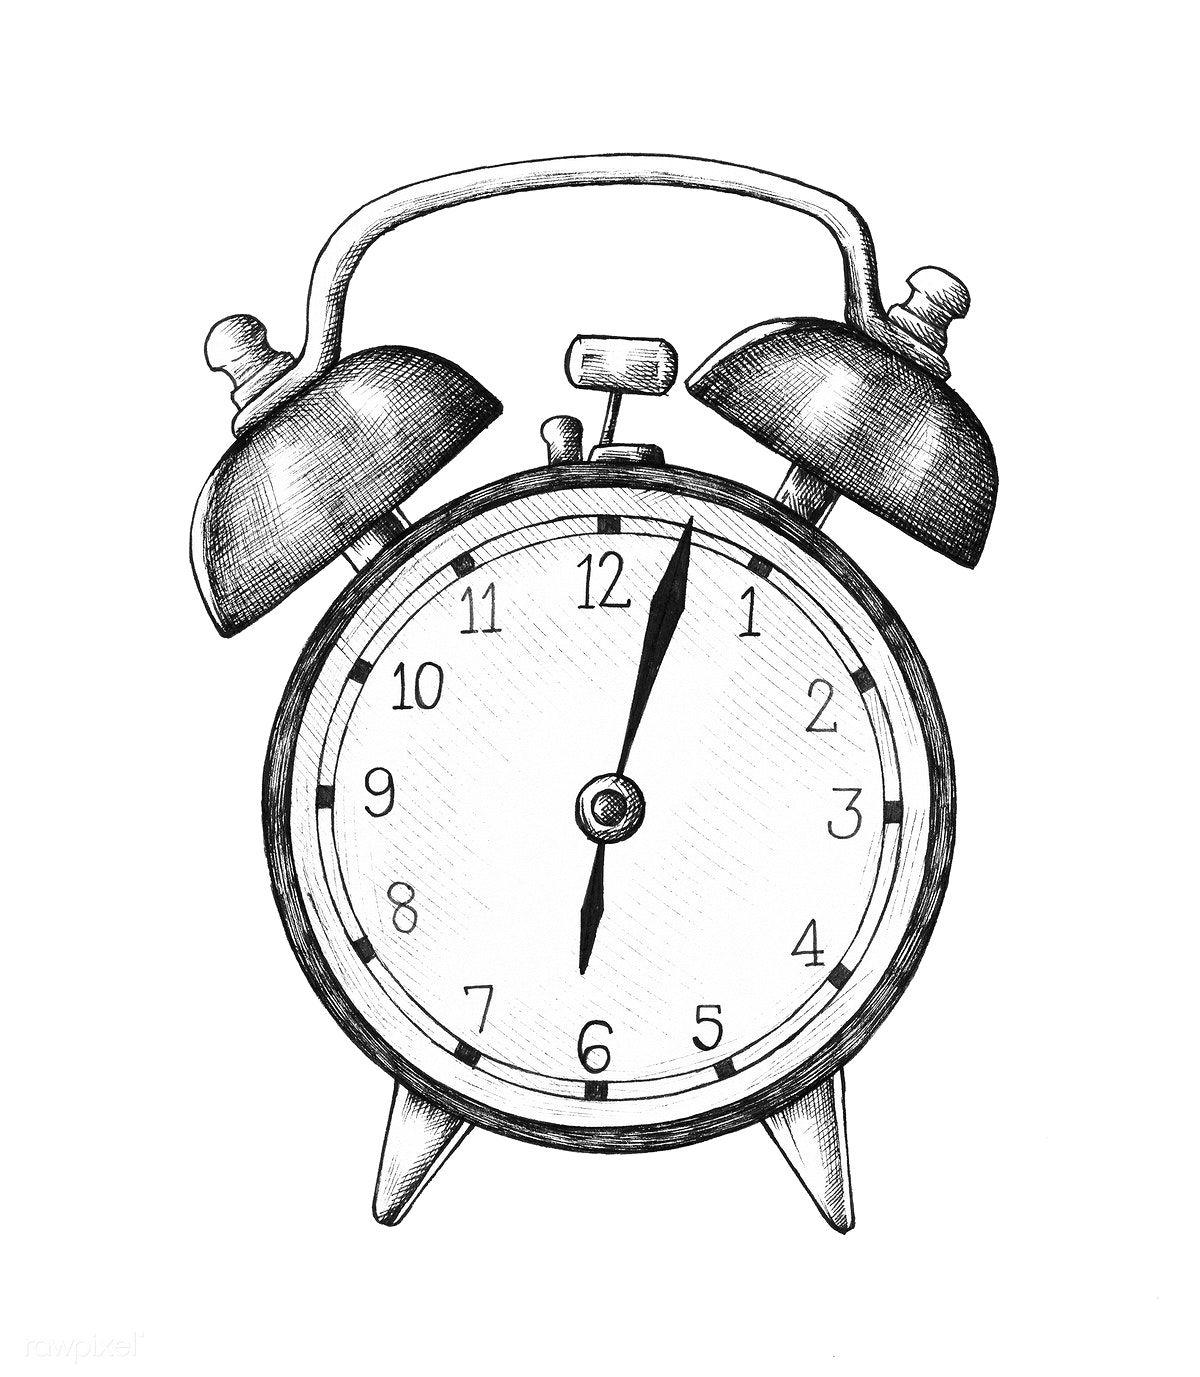 Handdrawn alarm clock illustration free image by